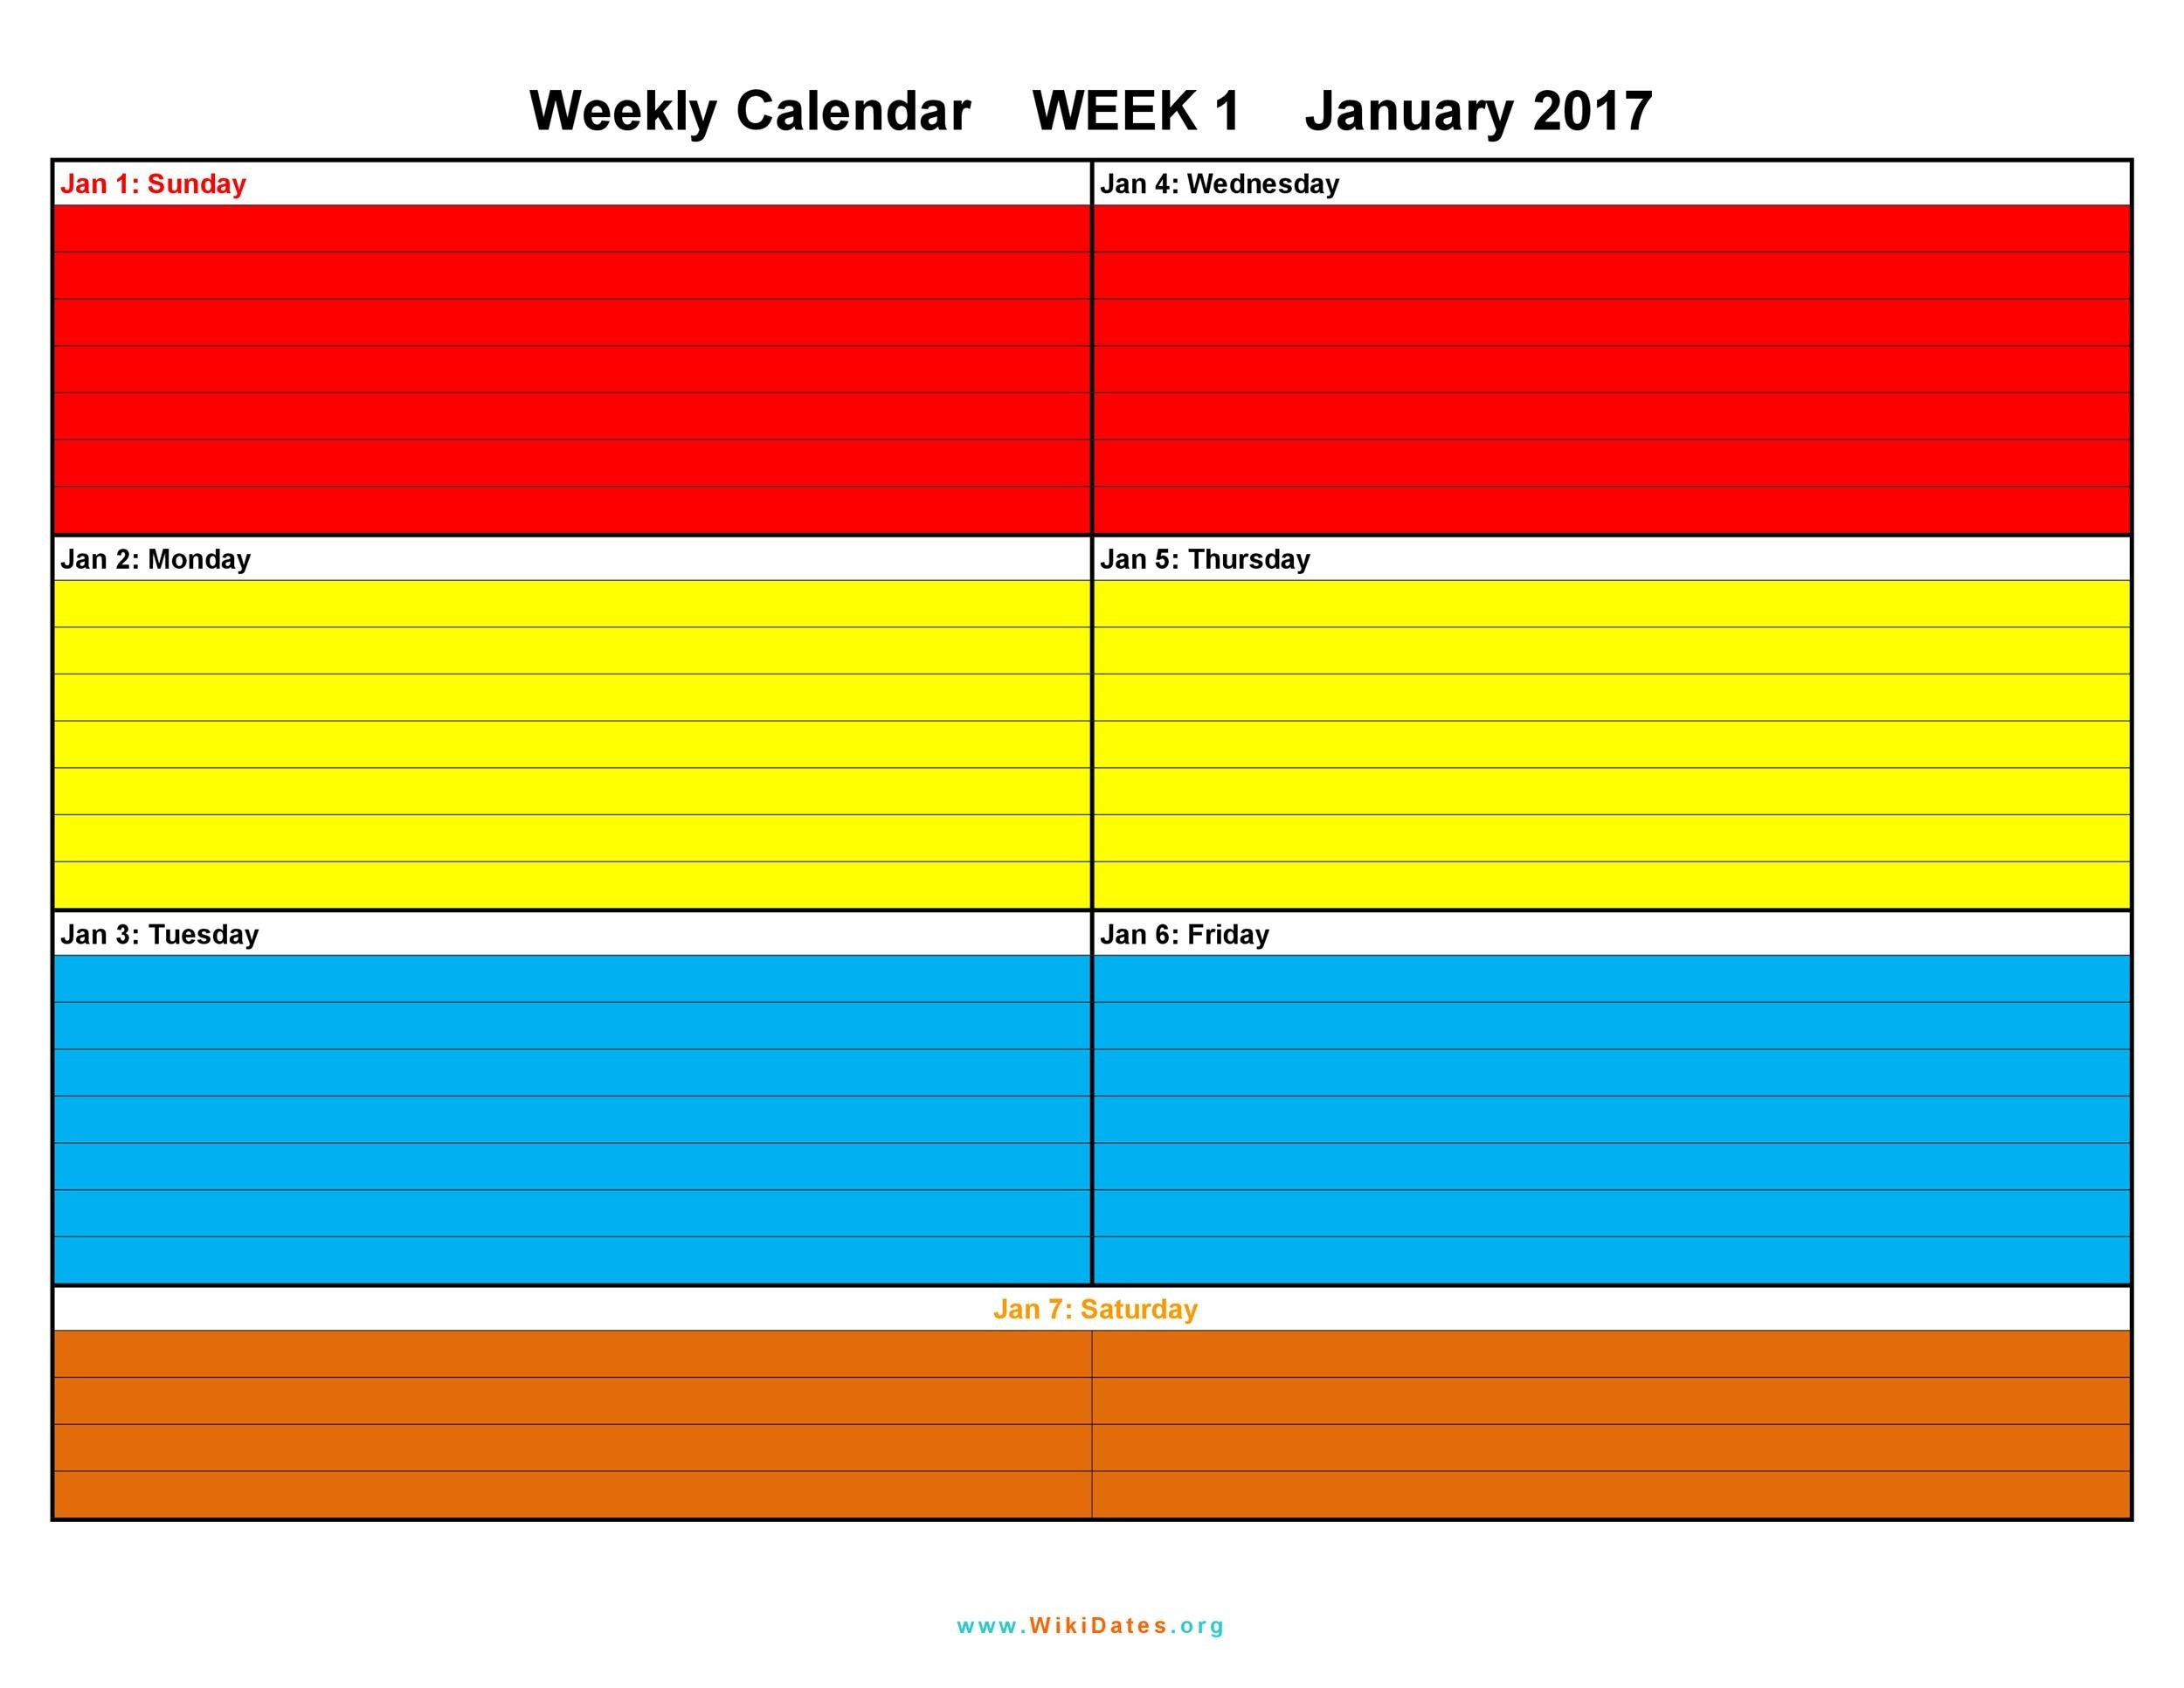 26 Blank Weekly Calendar Templates Pdf Excel Word